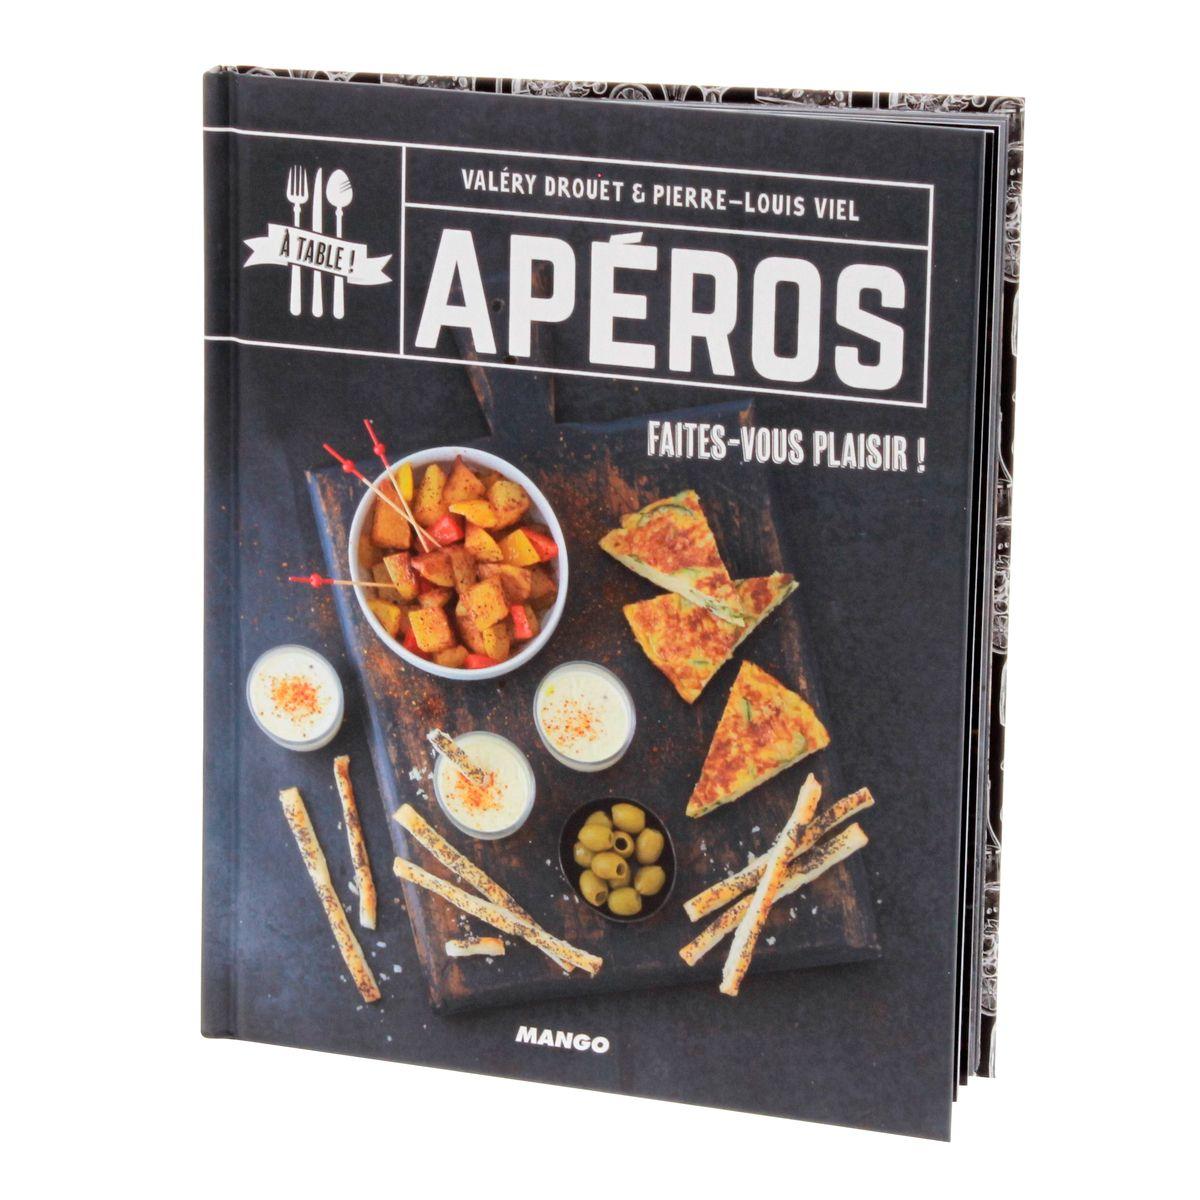 APEROS FAITES-VOUS PLAISIR - MANGO